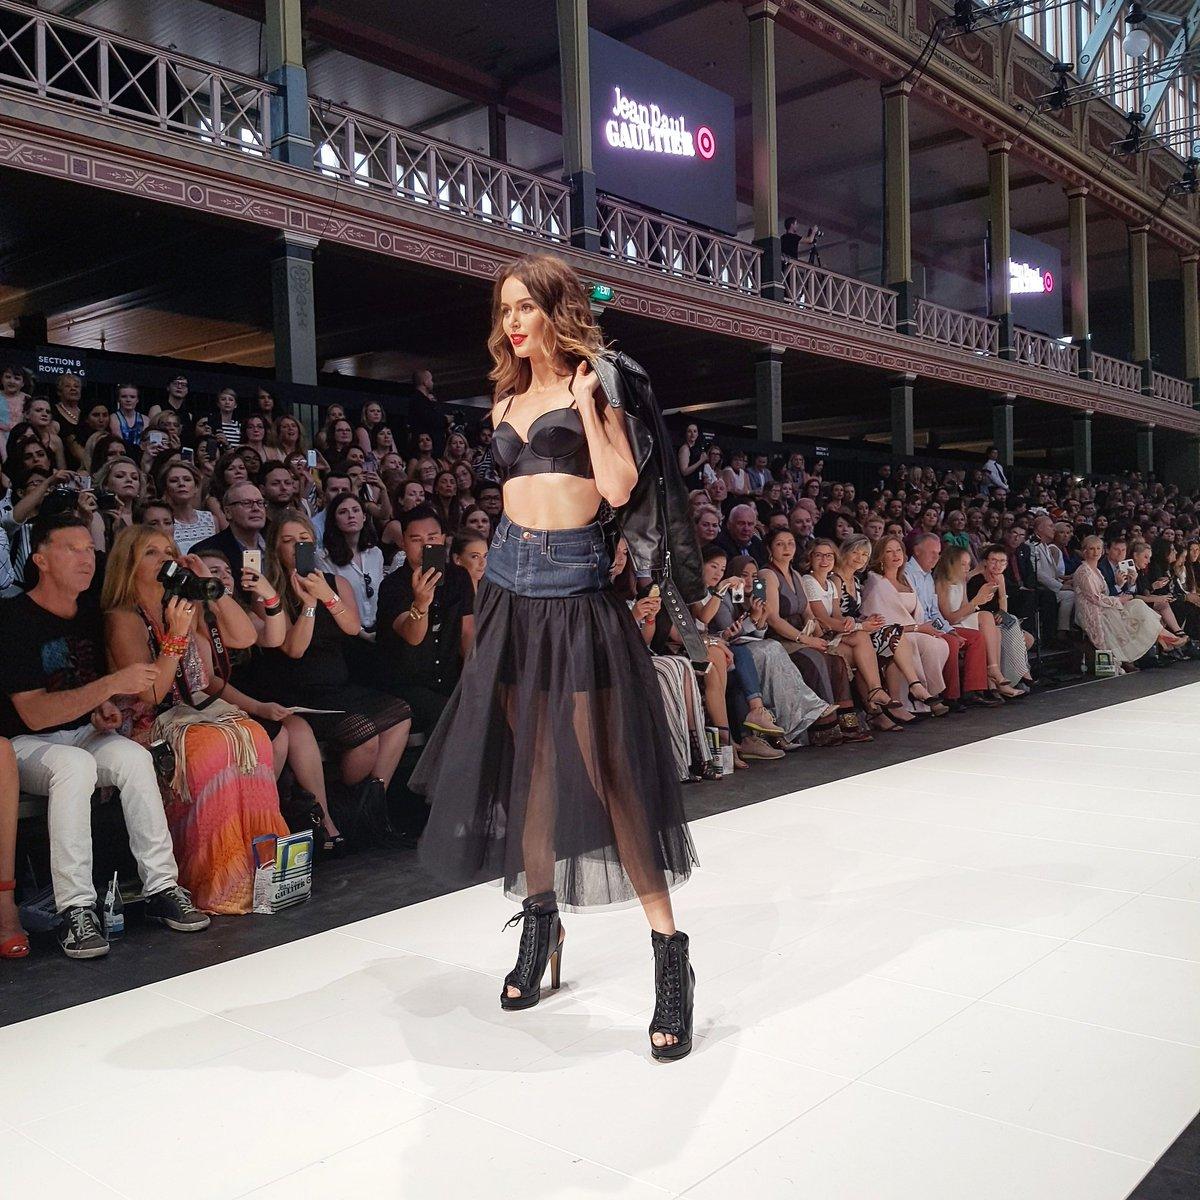 Supermodel @nictrunfio opens the #JPGforTarget Runway show #VAMFF https://t.co/8DhLj2THI7